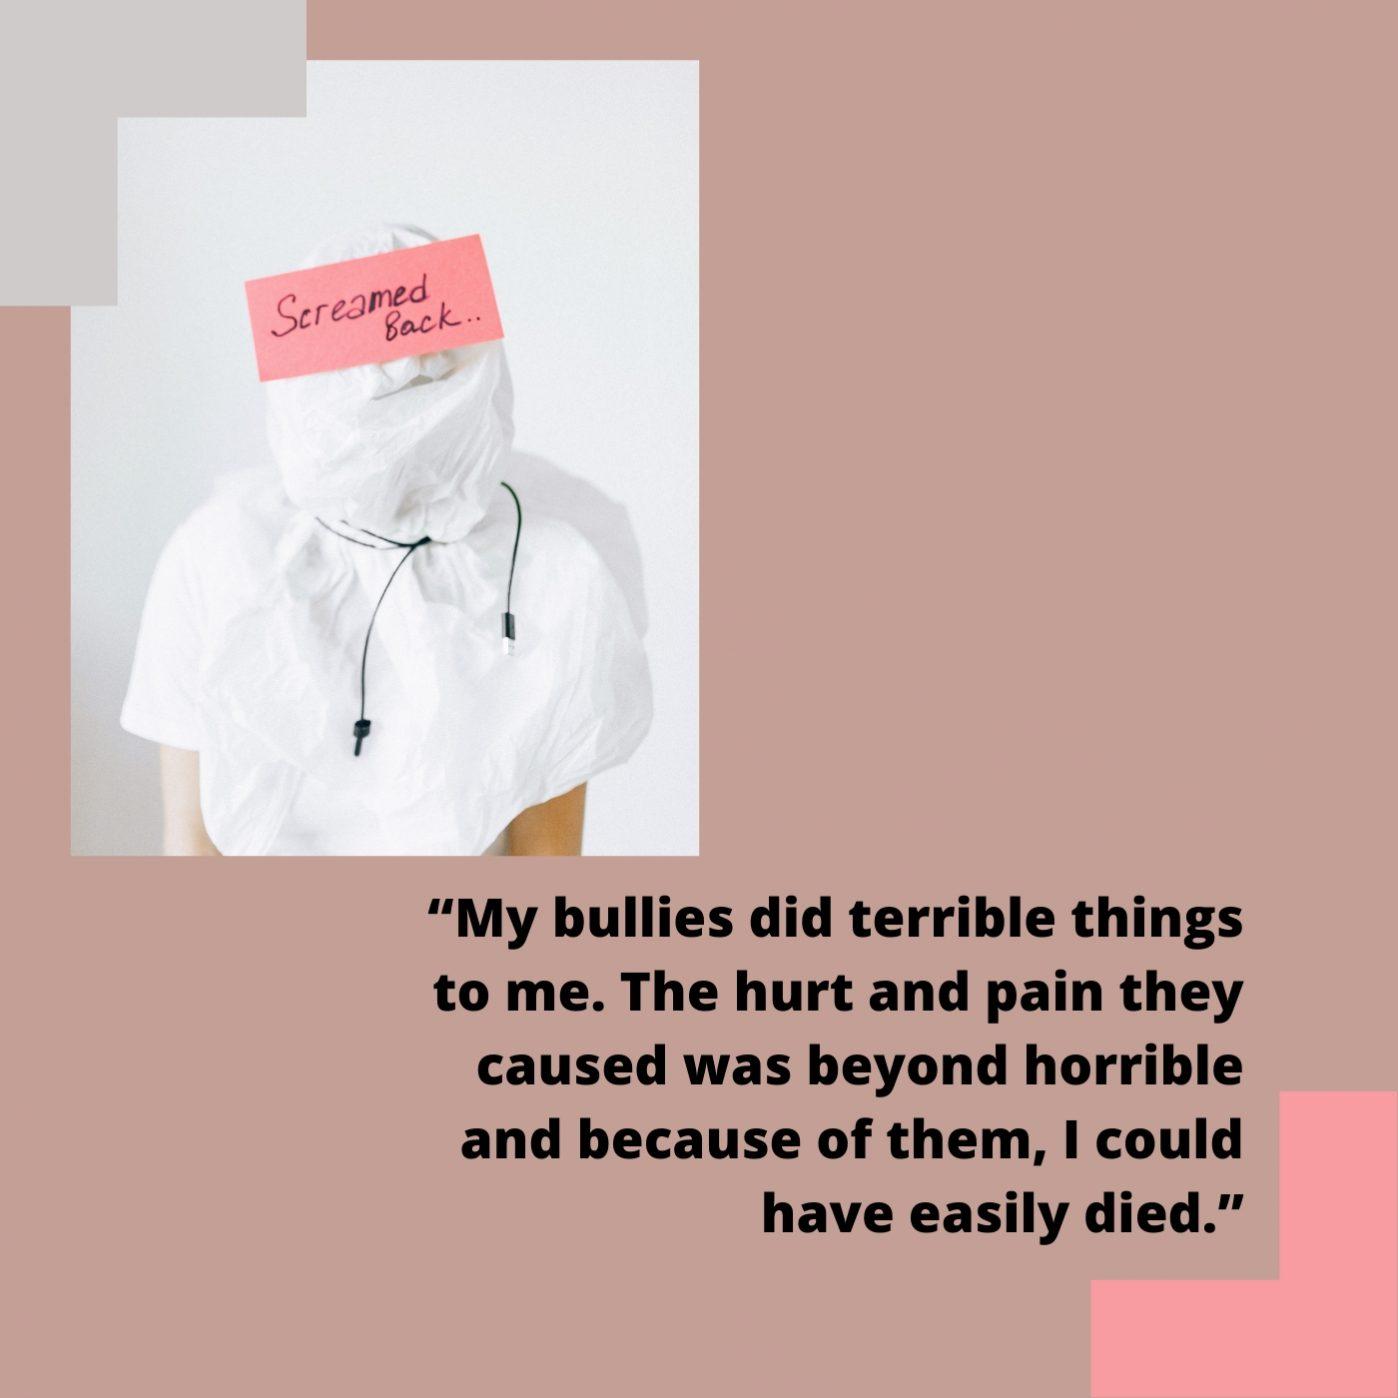 anti-bullying-week-2020